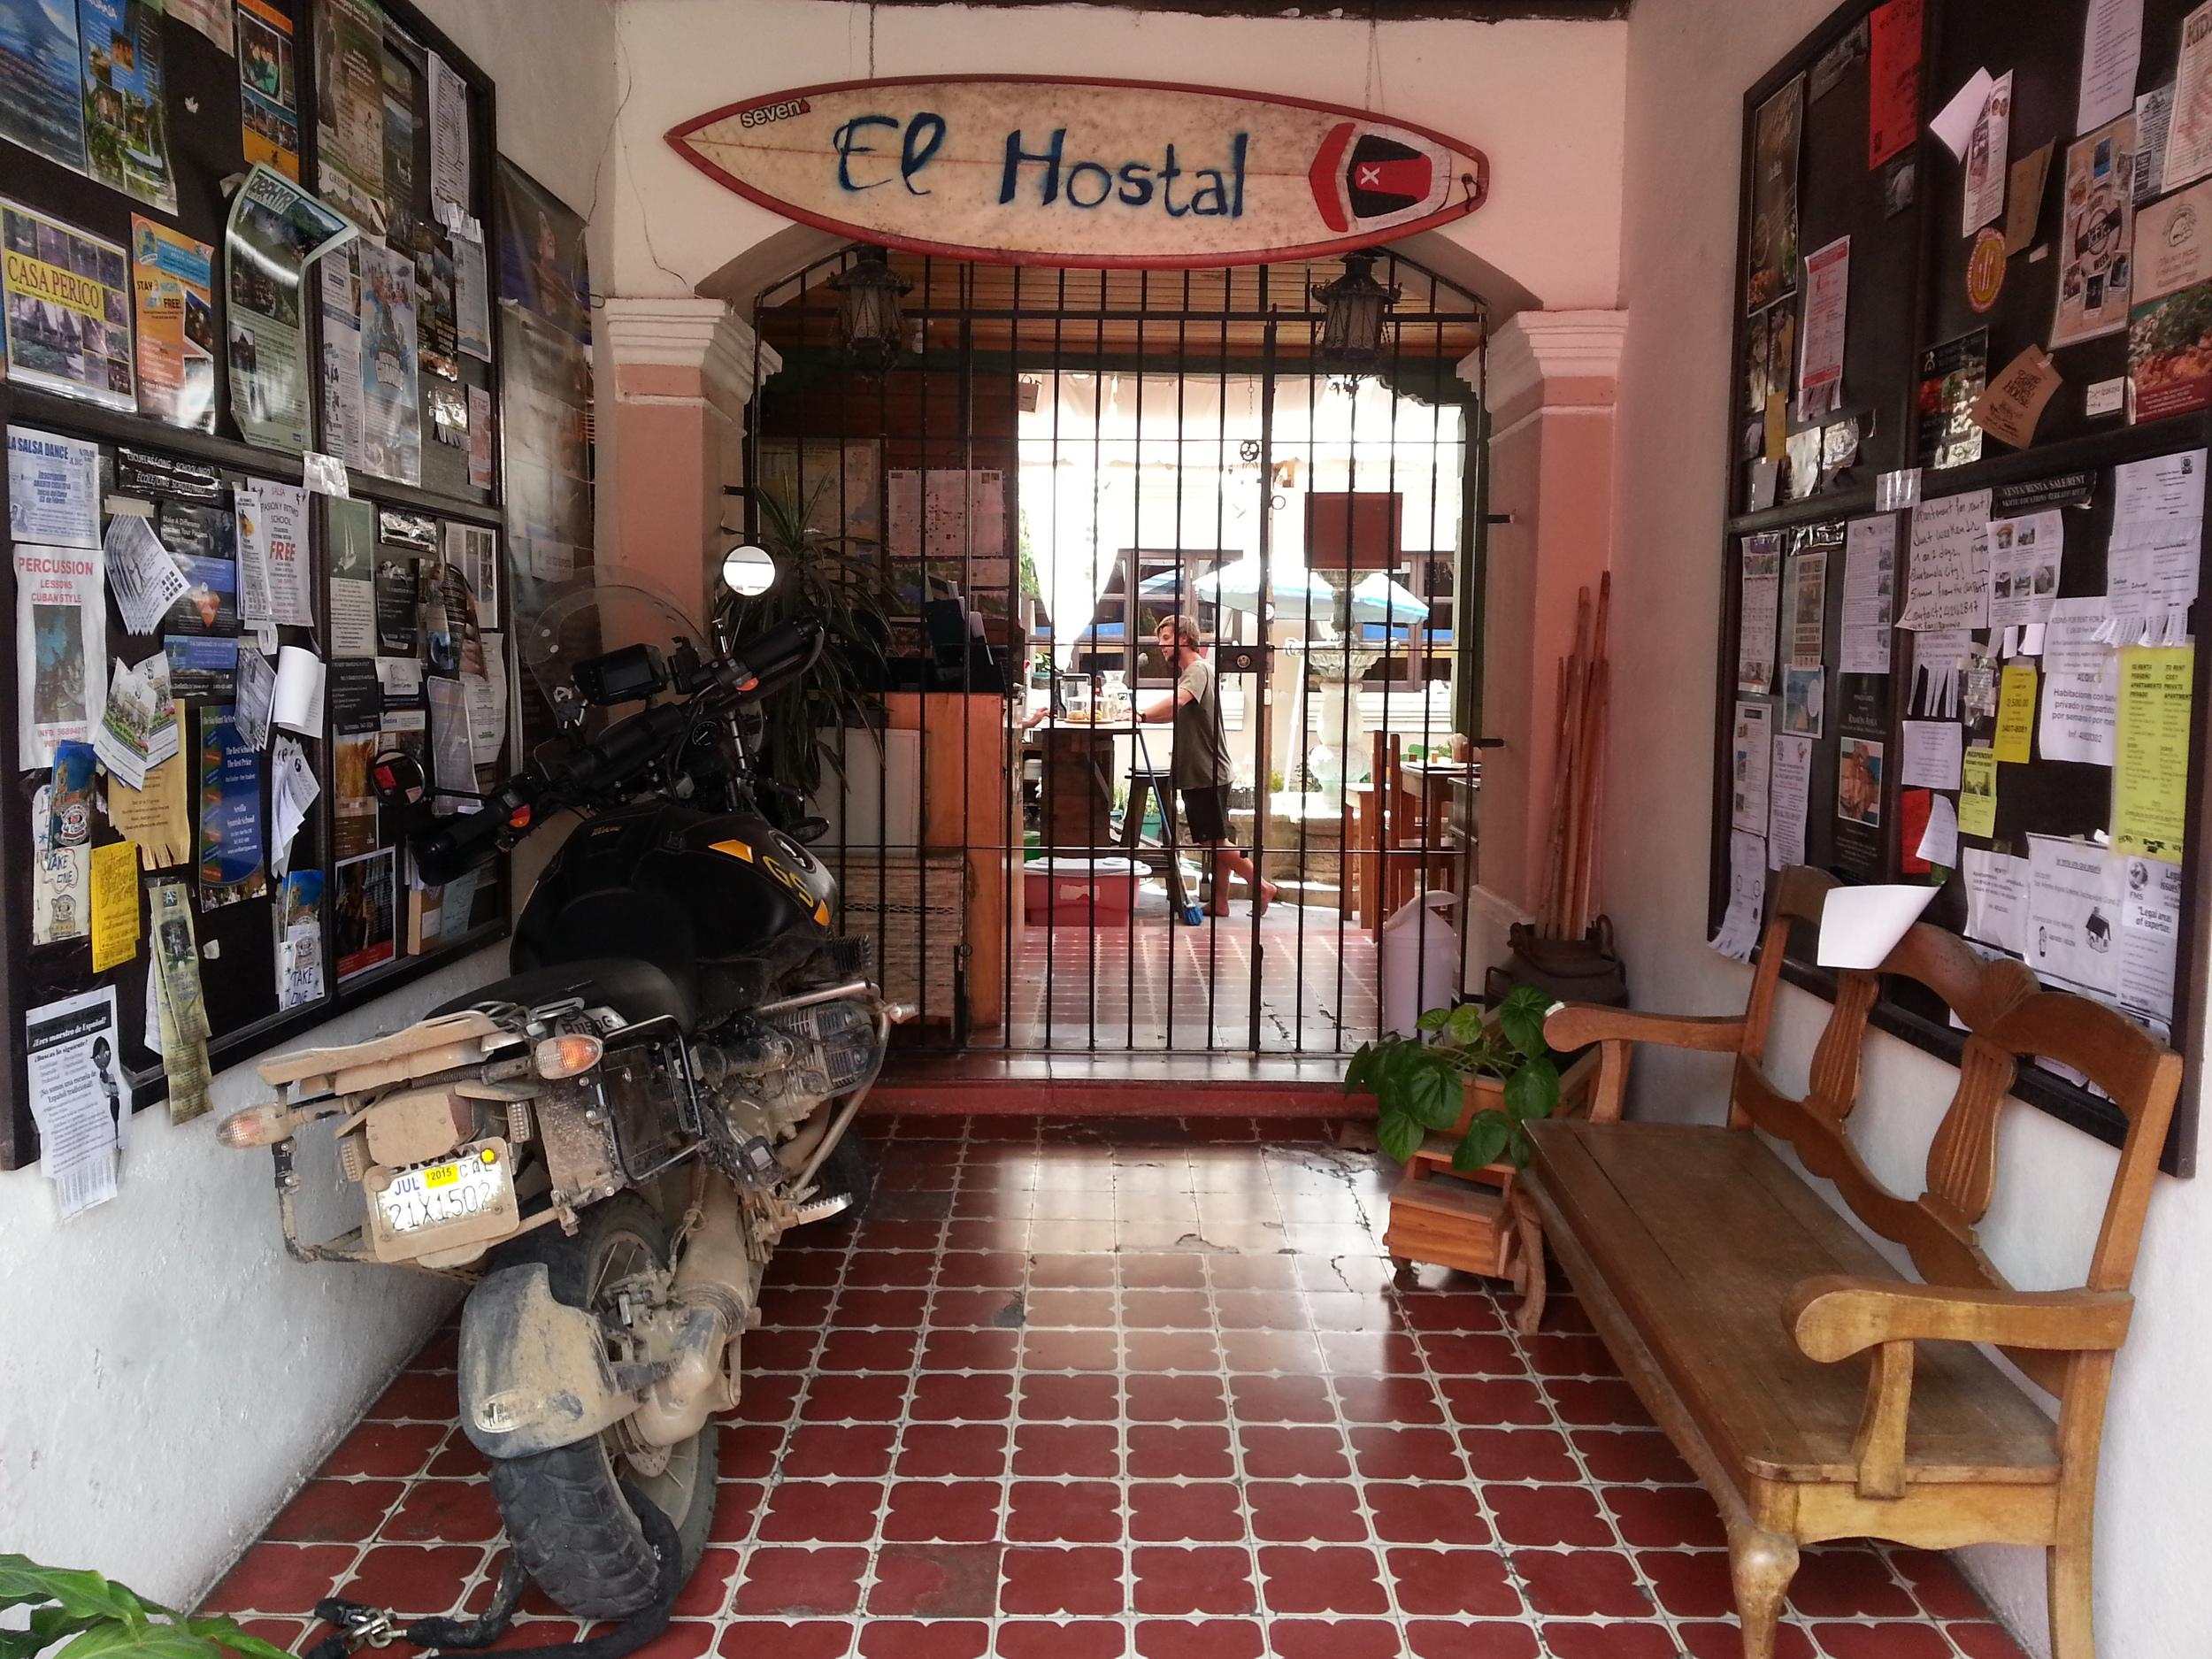 El Hostal,Antigua, Guatemala